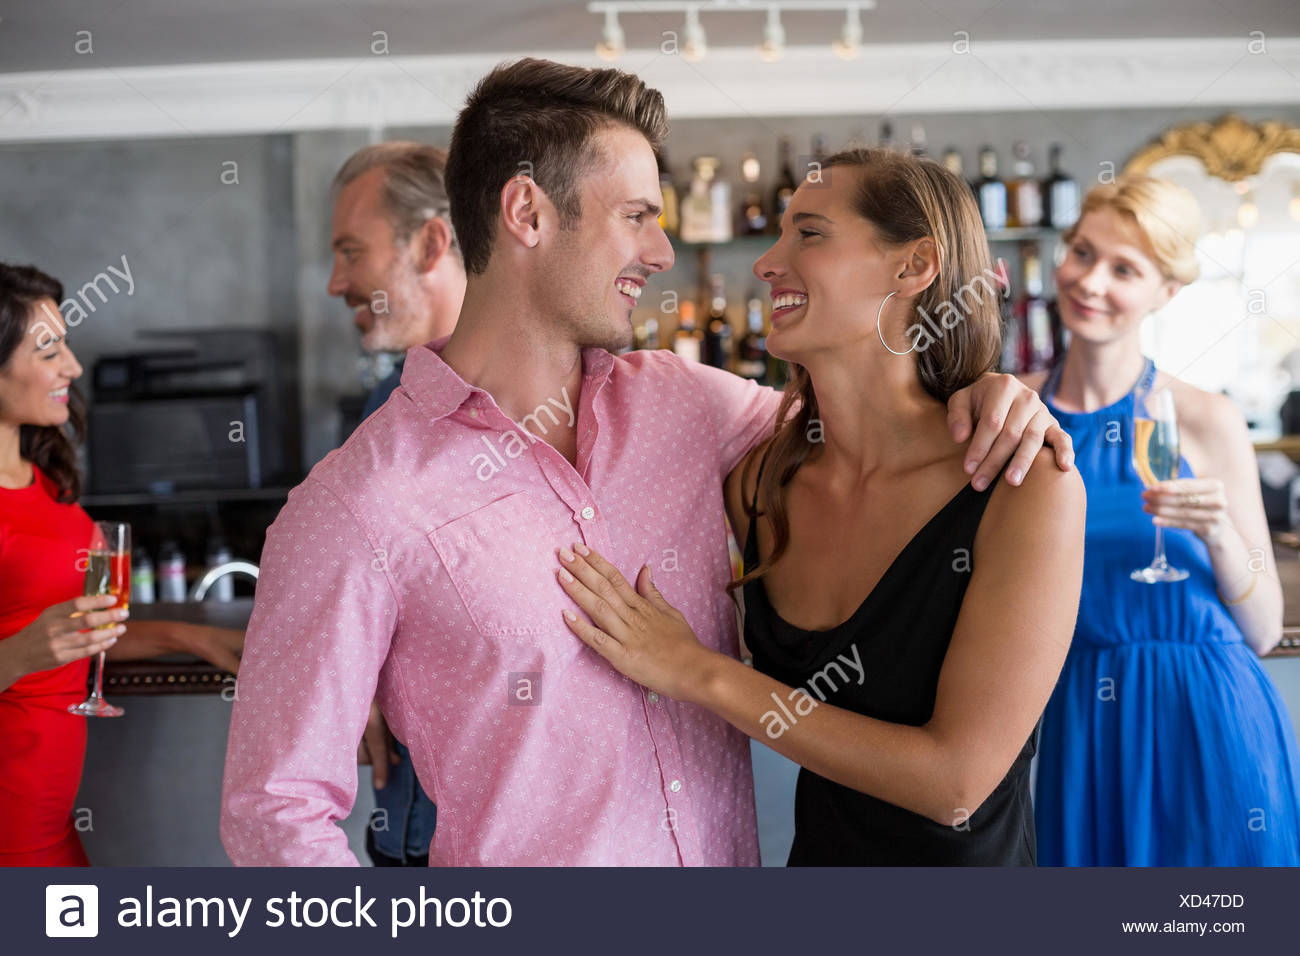 Couple in restaurant Photo Stock